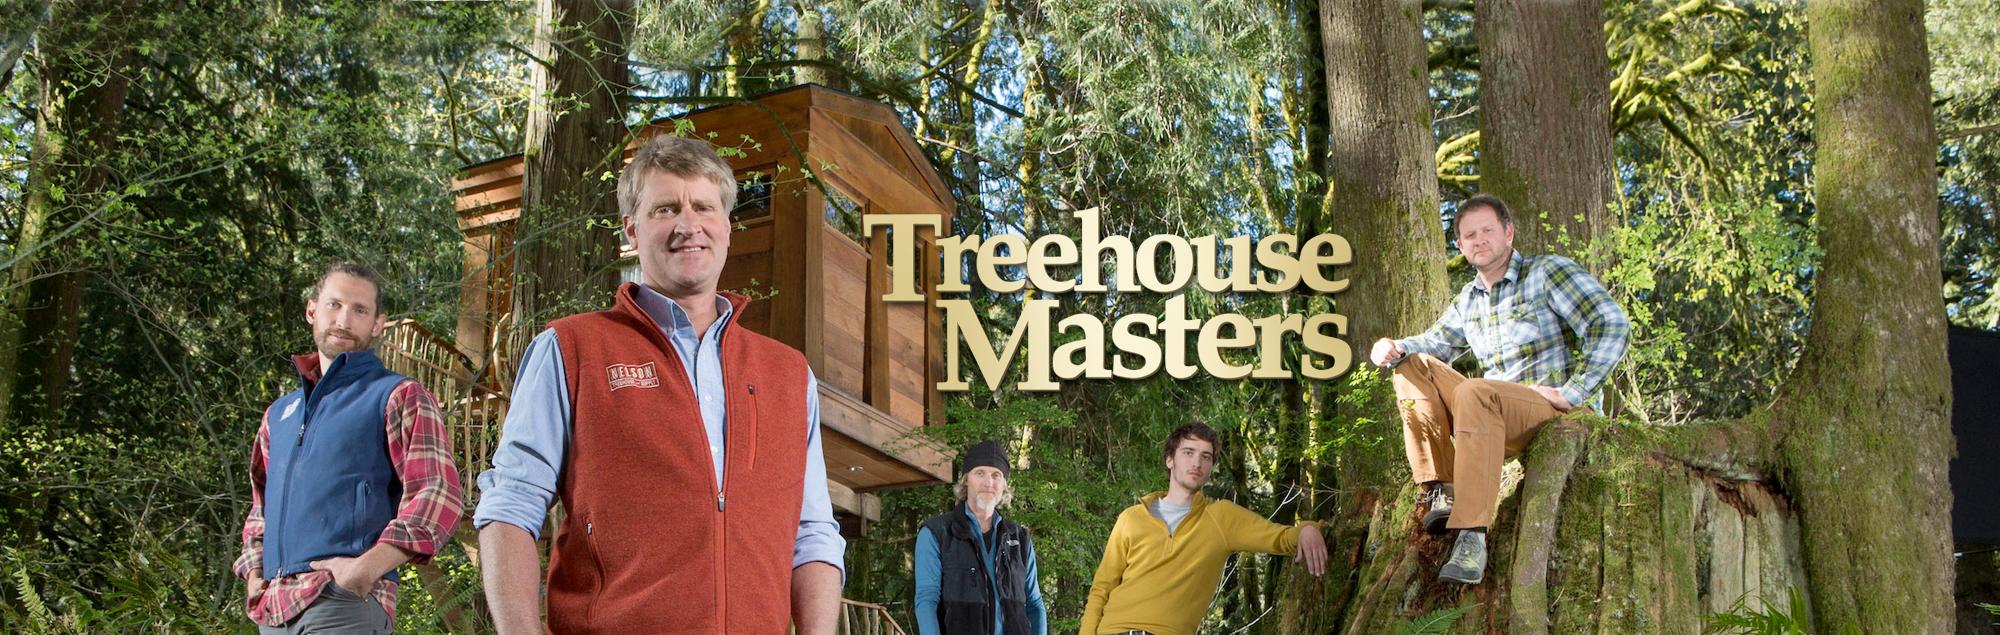 treehousemasters1